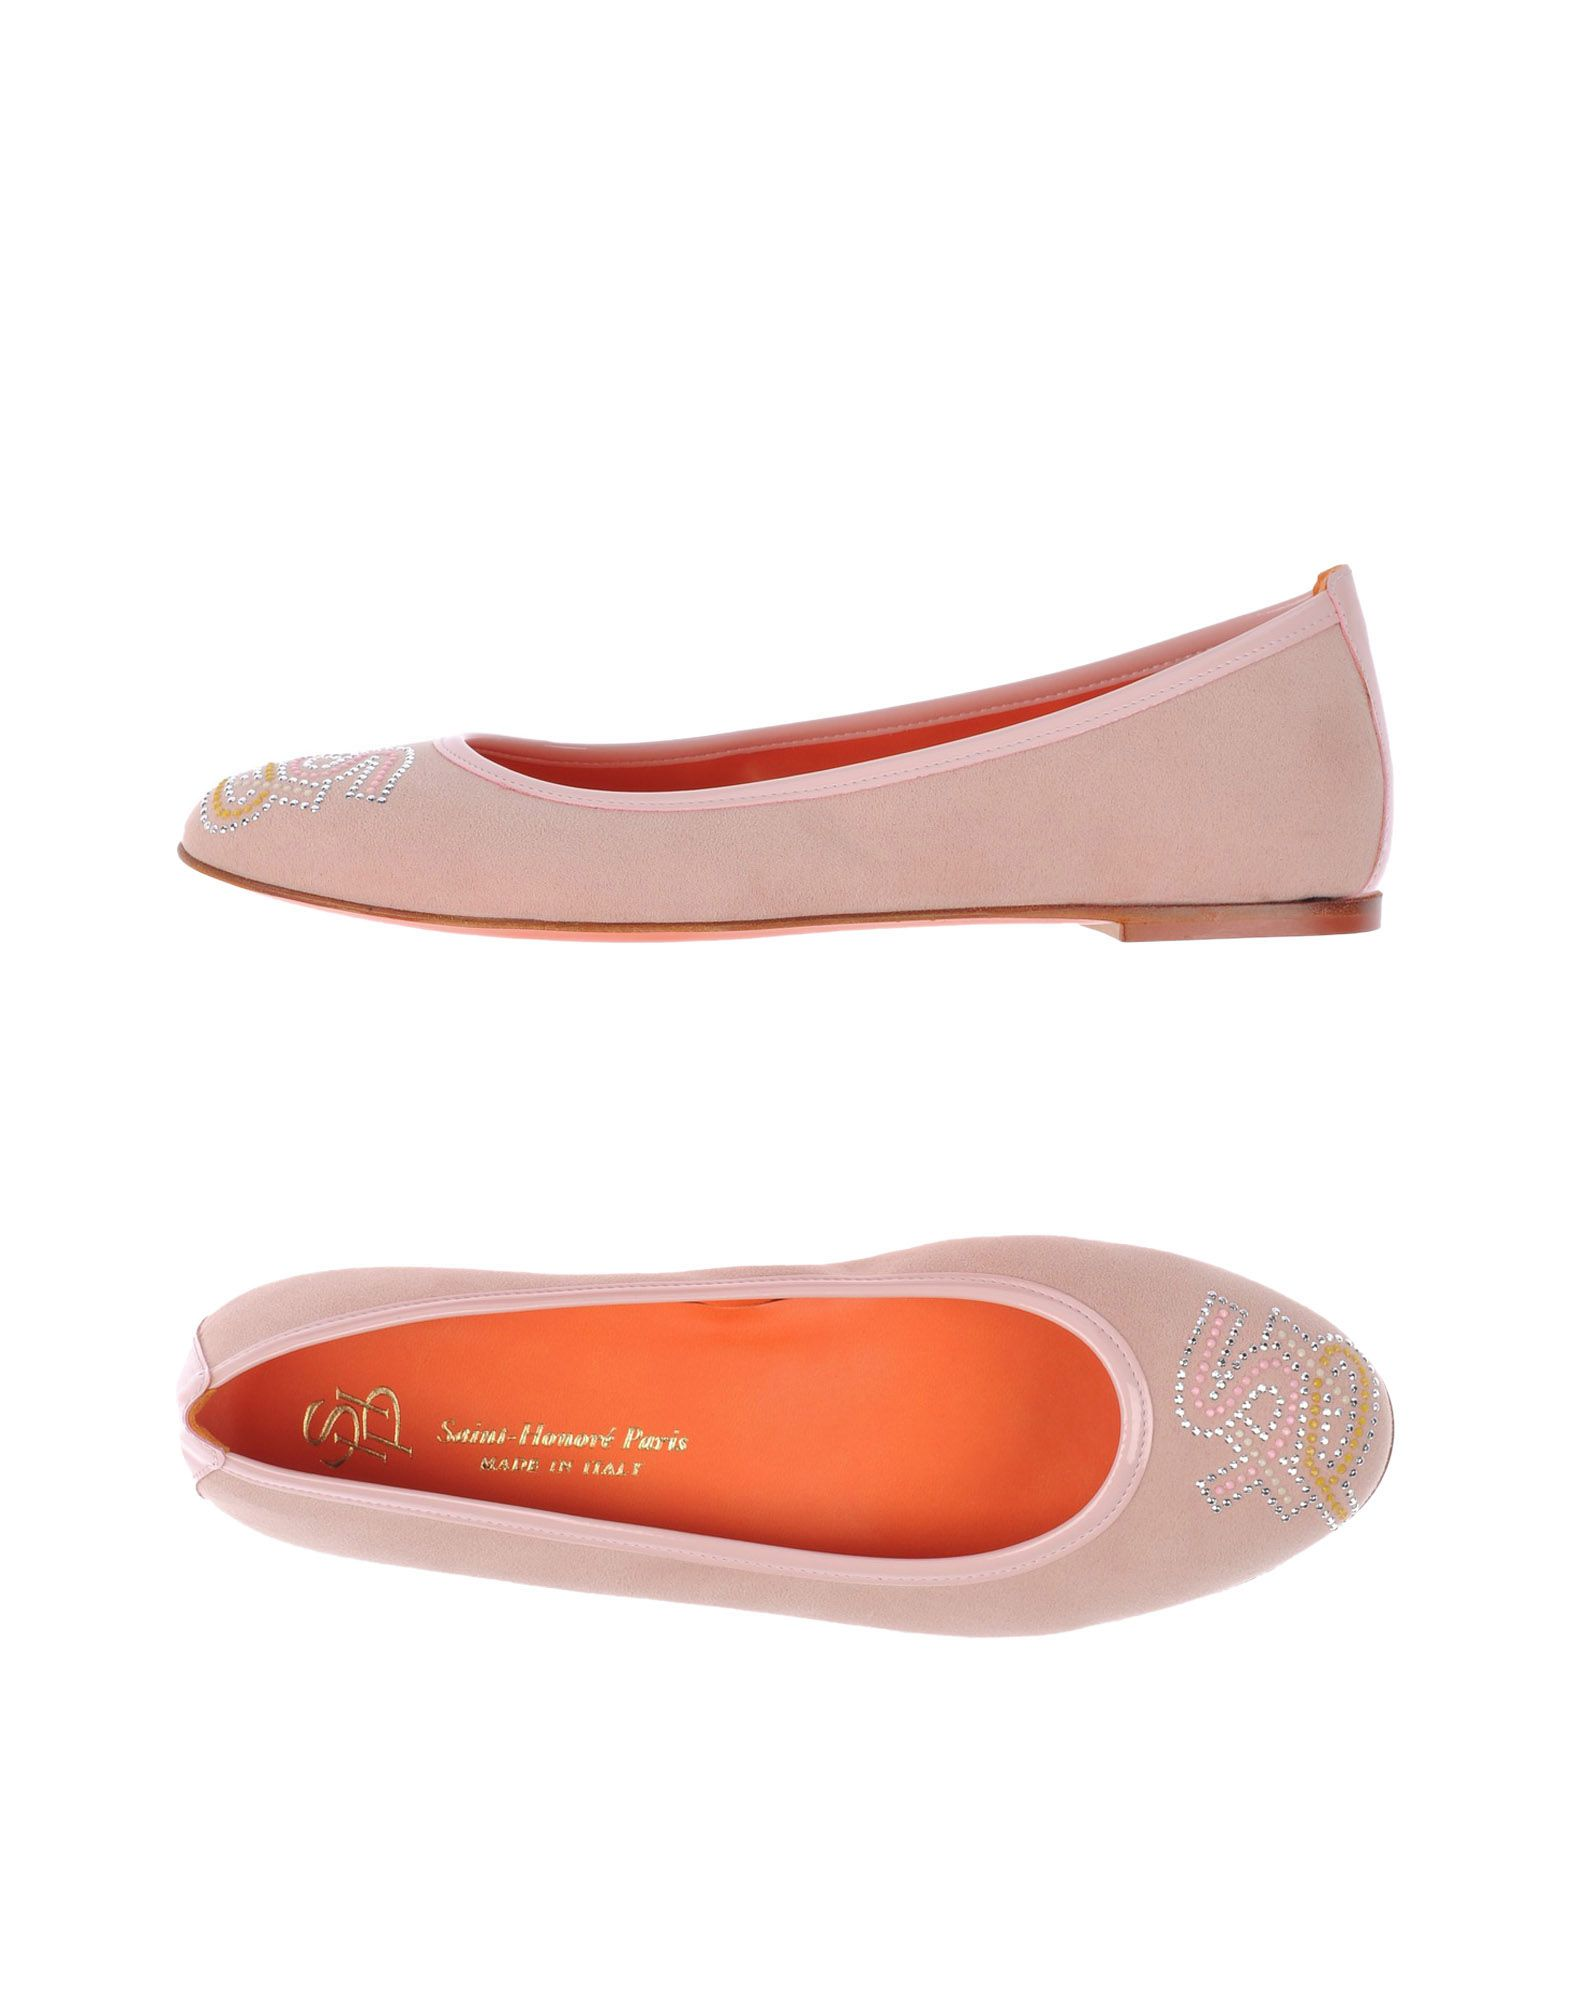 Saint 11169310DA Gute Qualität beliebte beliebte Qualität Schuhe 3ff7b2